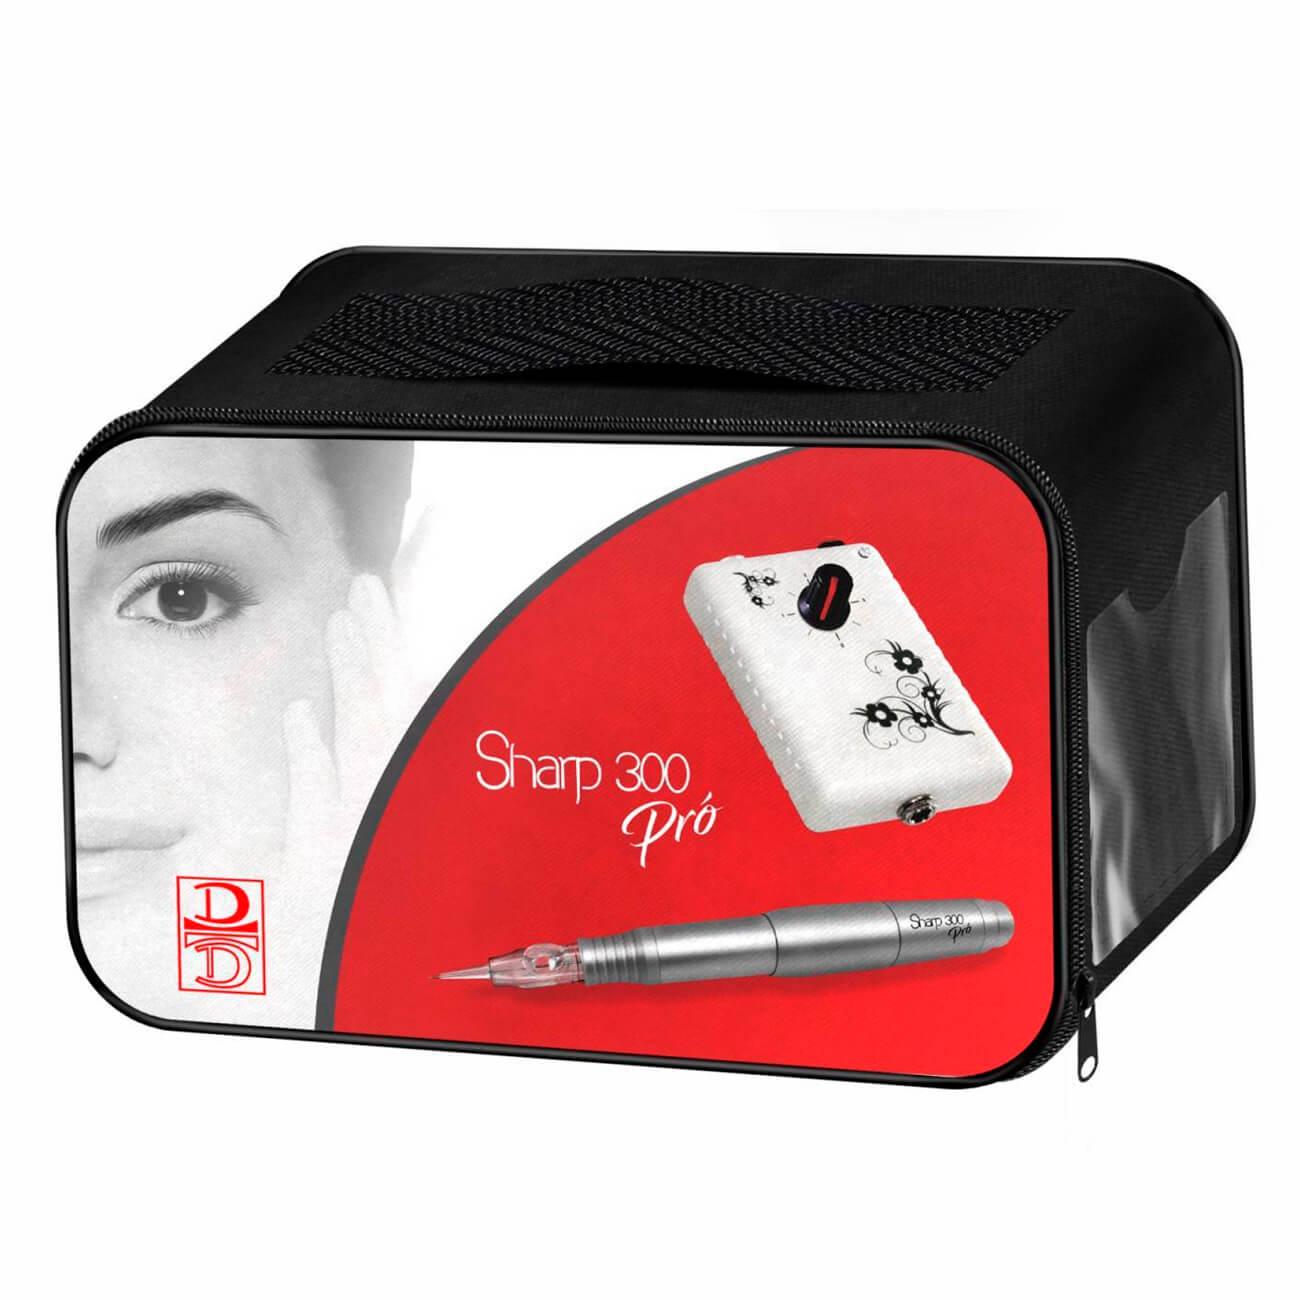 Conjunto Controle Analógico + Dermógrafo Sharp 300 Pró Prata